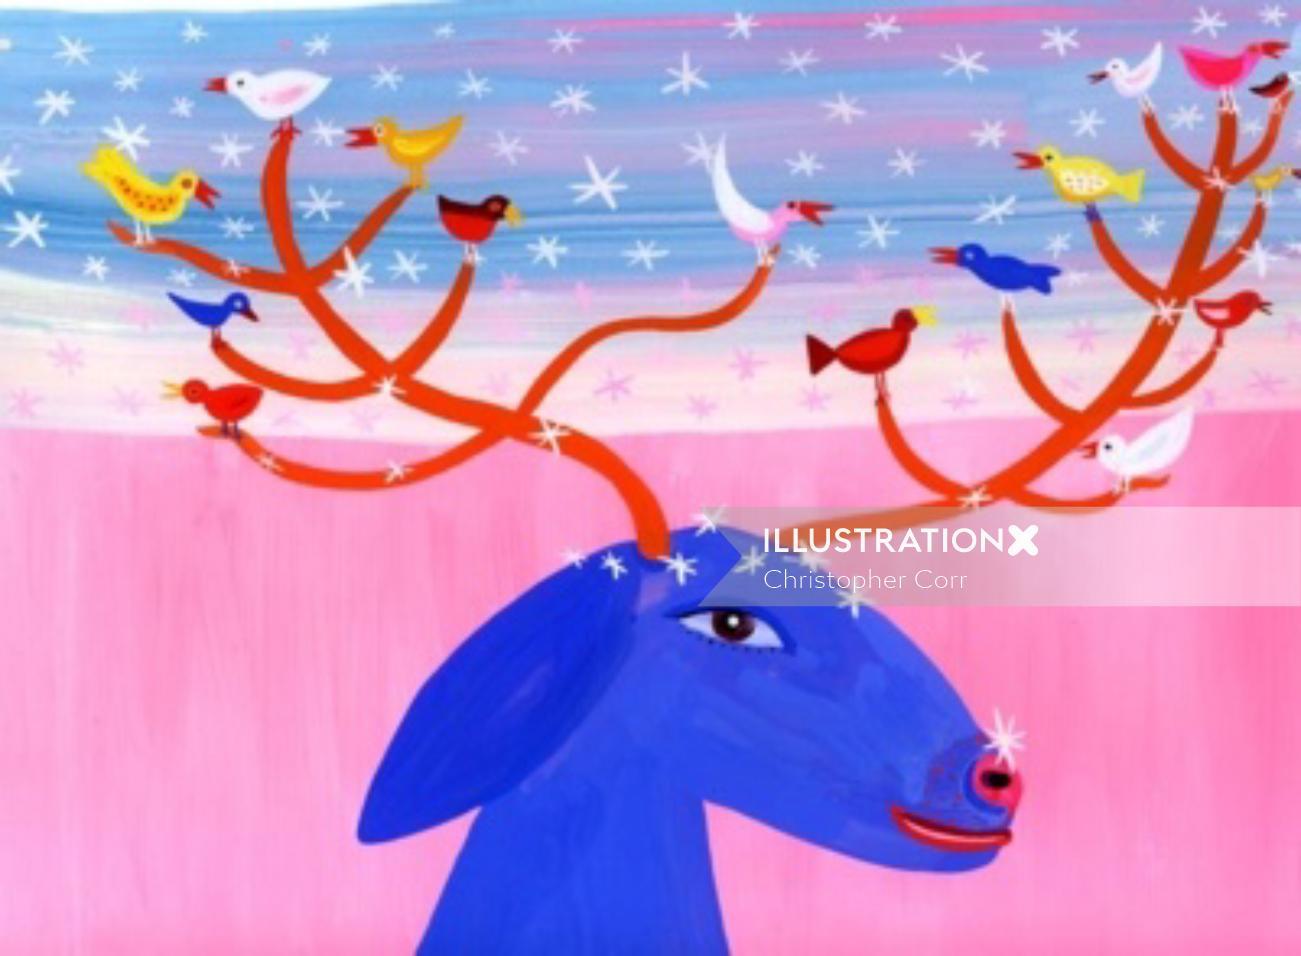 Illustration of birds sitting on deer horns